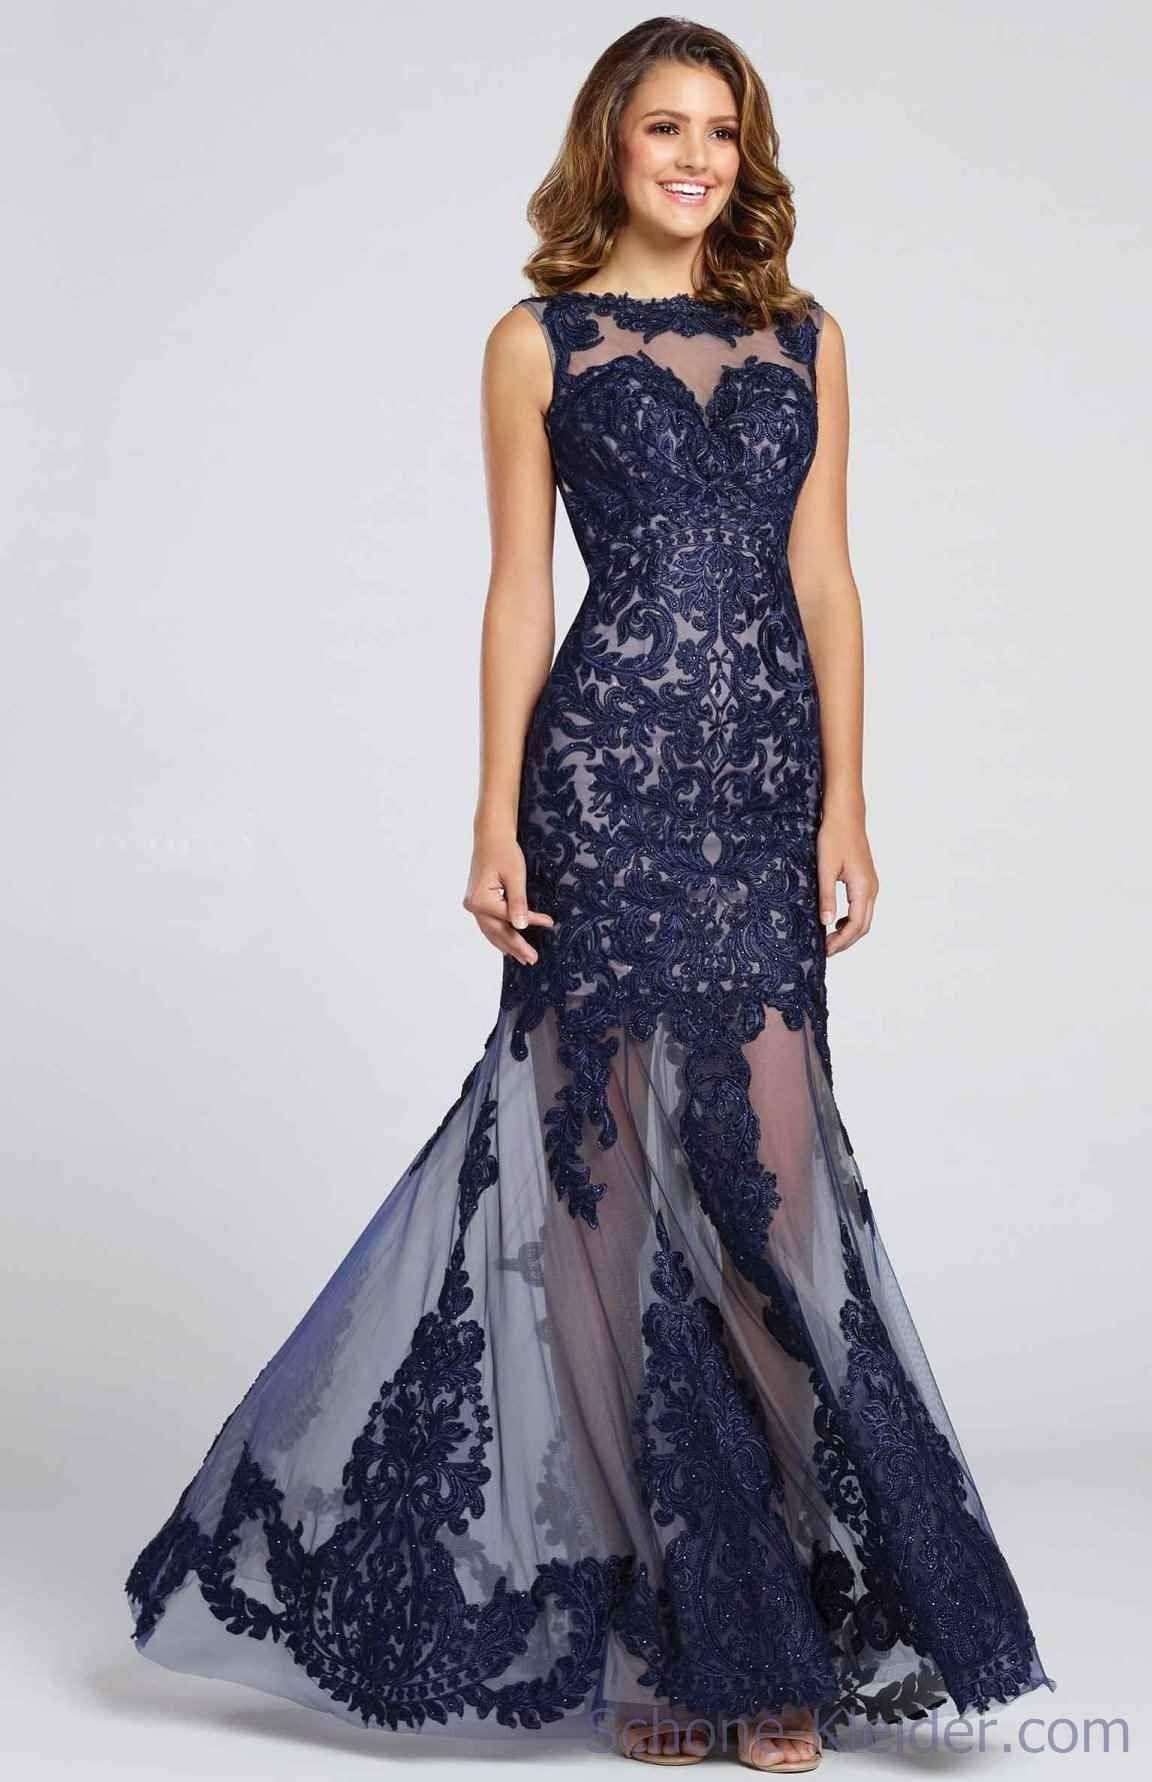 Coolste Edle Abendkleider Lang Spezialgebiet - Abendkleid